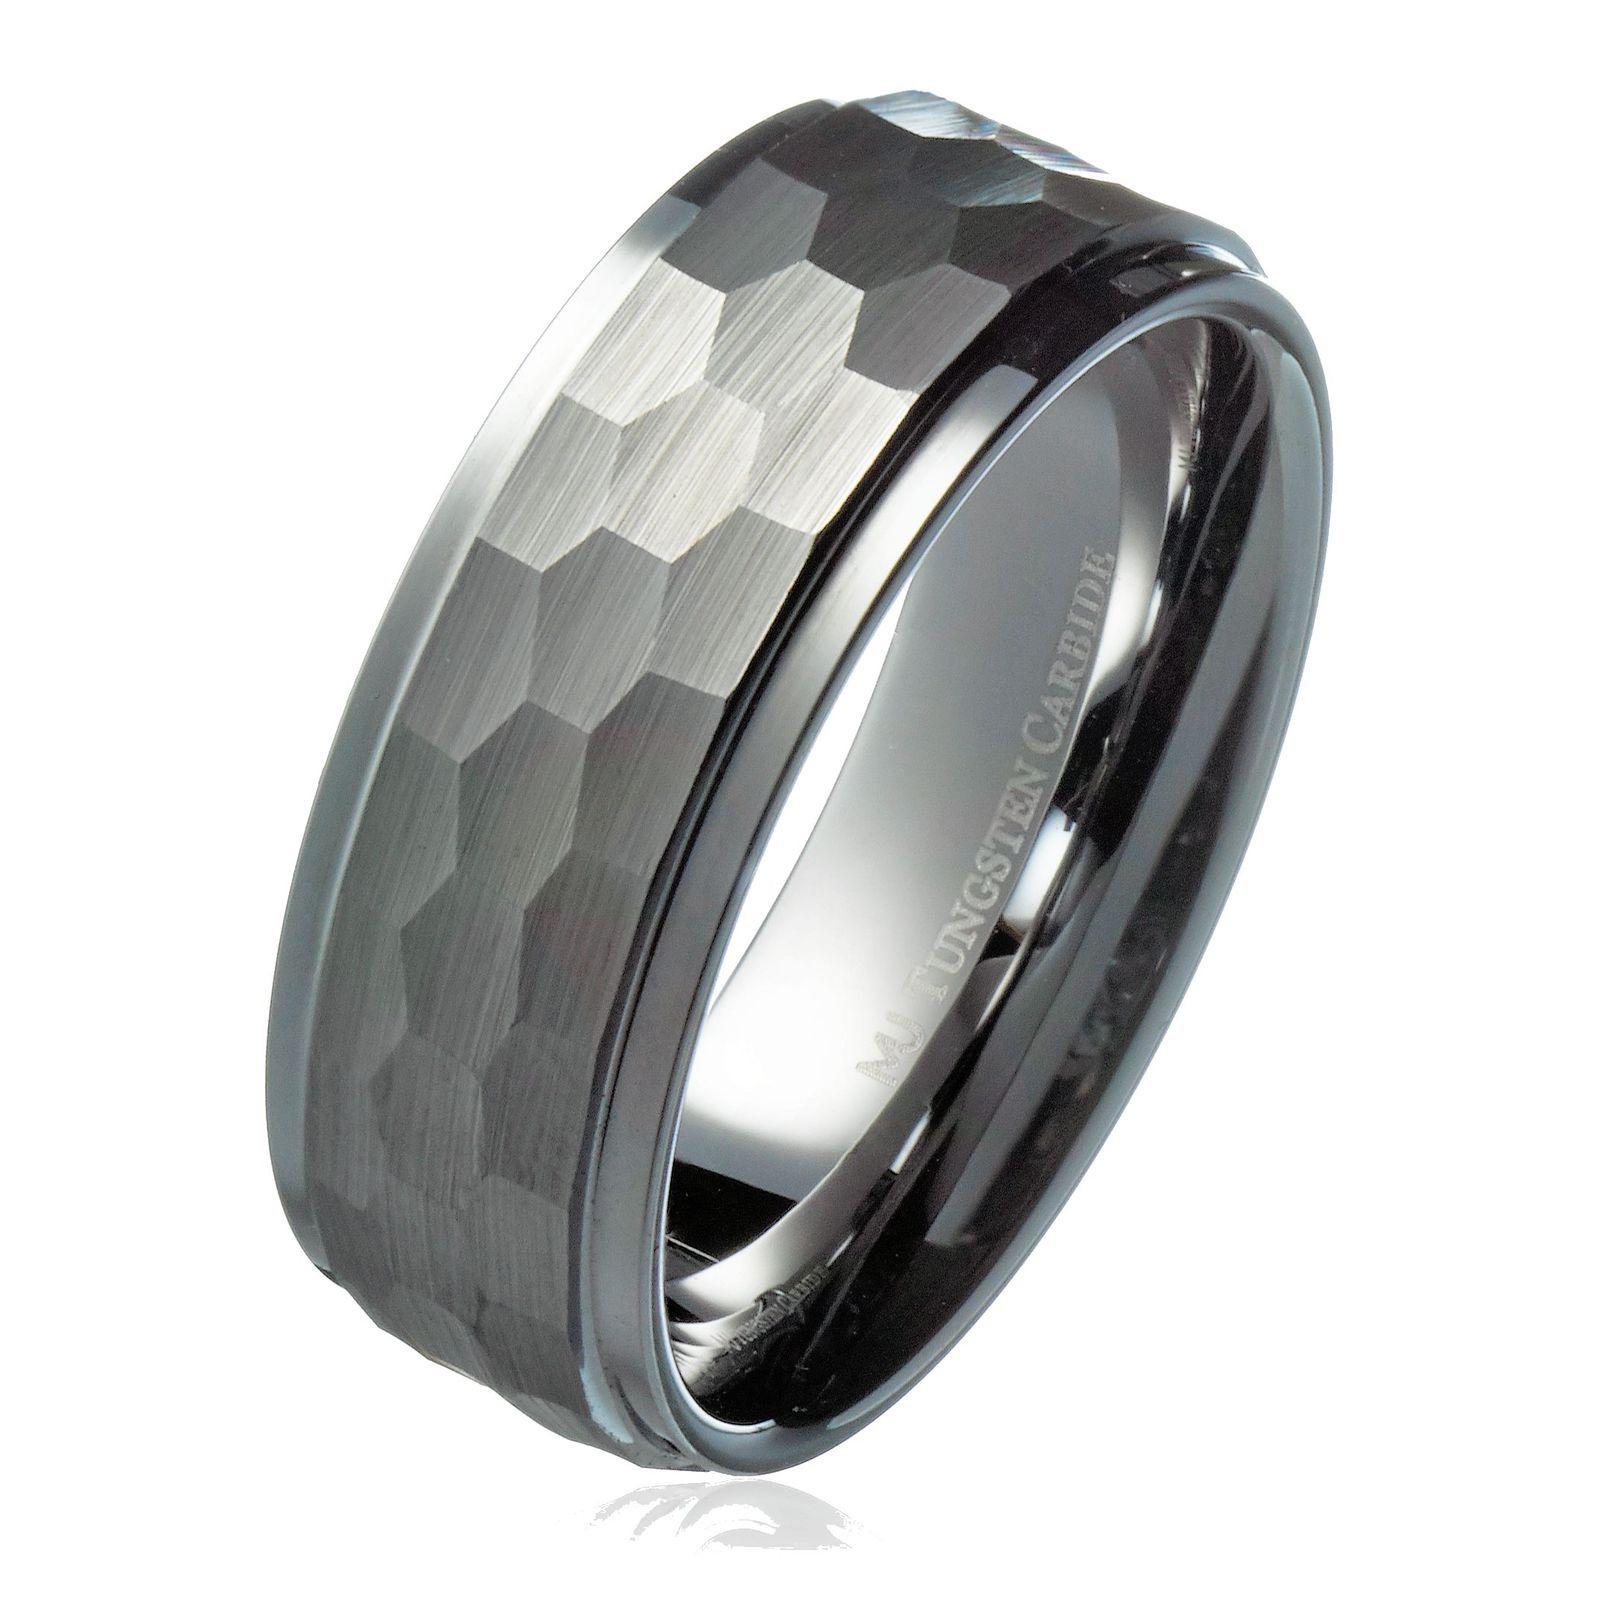 Mj Metals Jewelry Rings Ebay Fashion Tankees Wedding